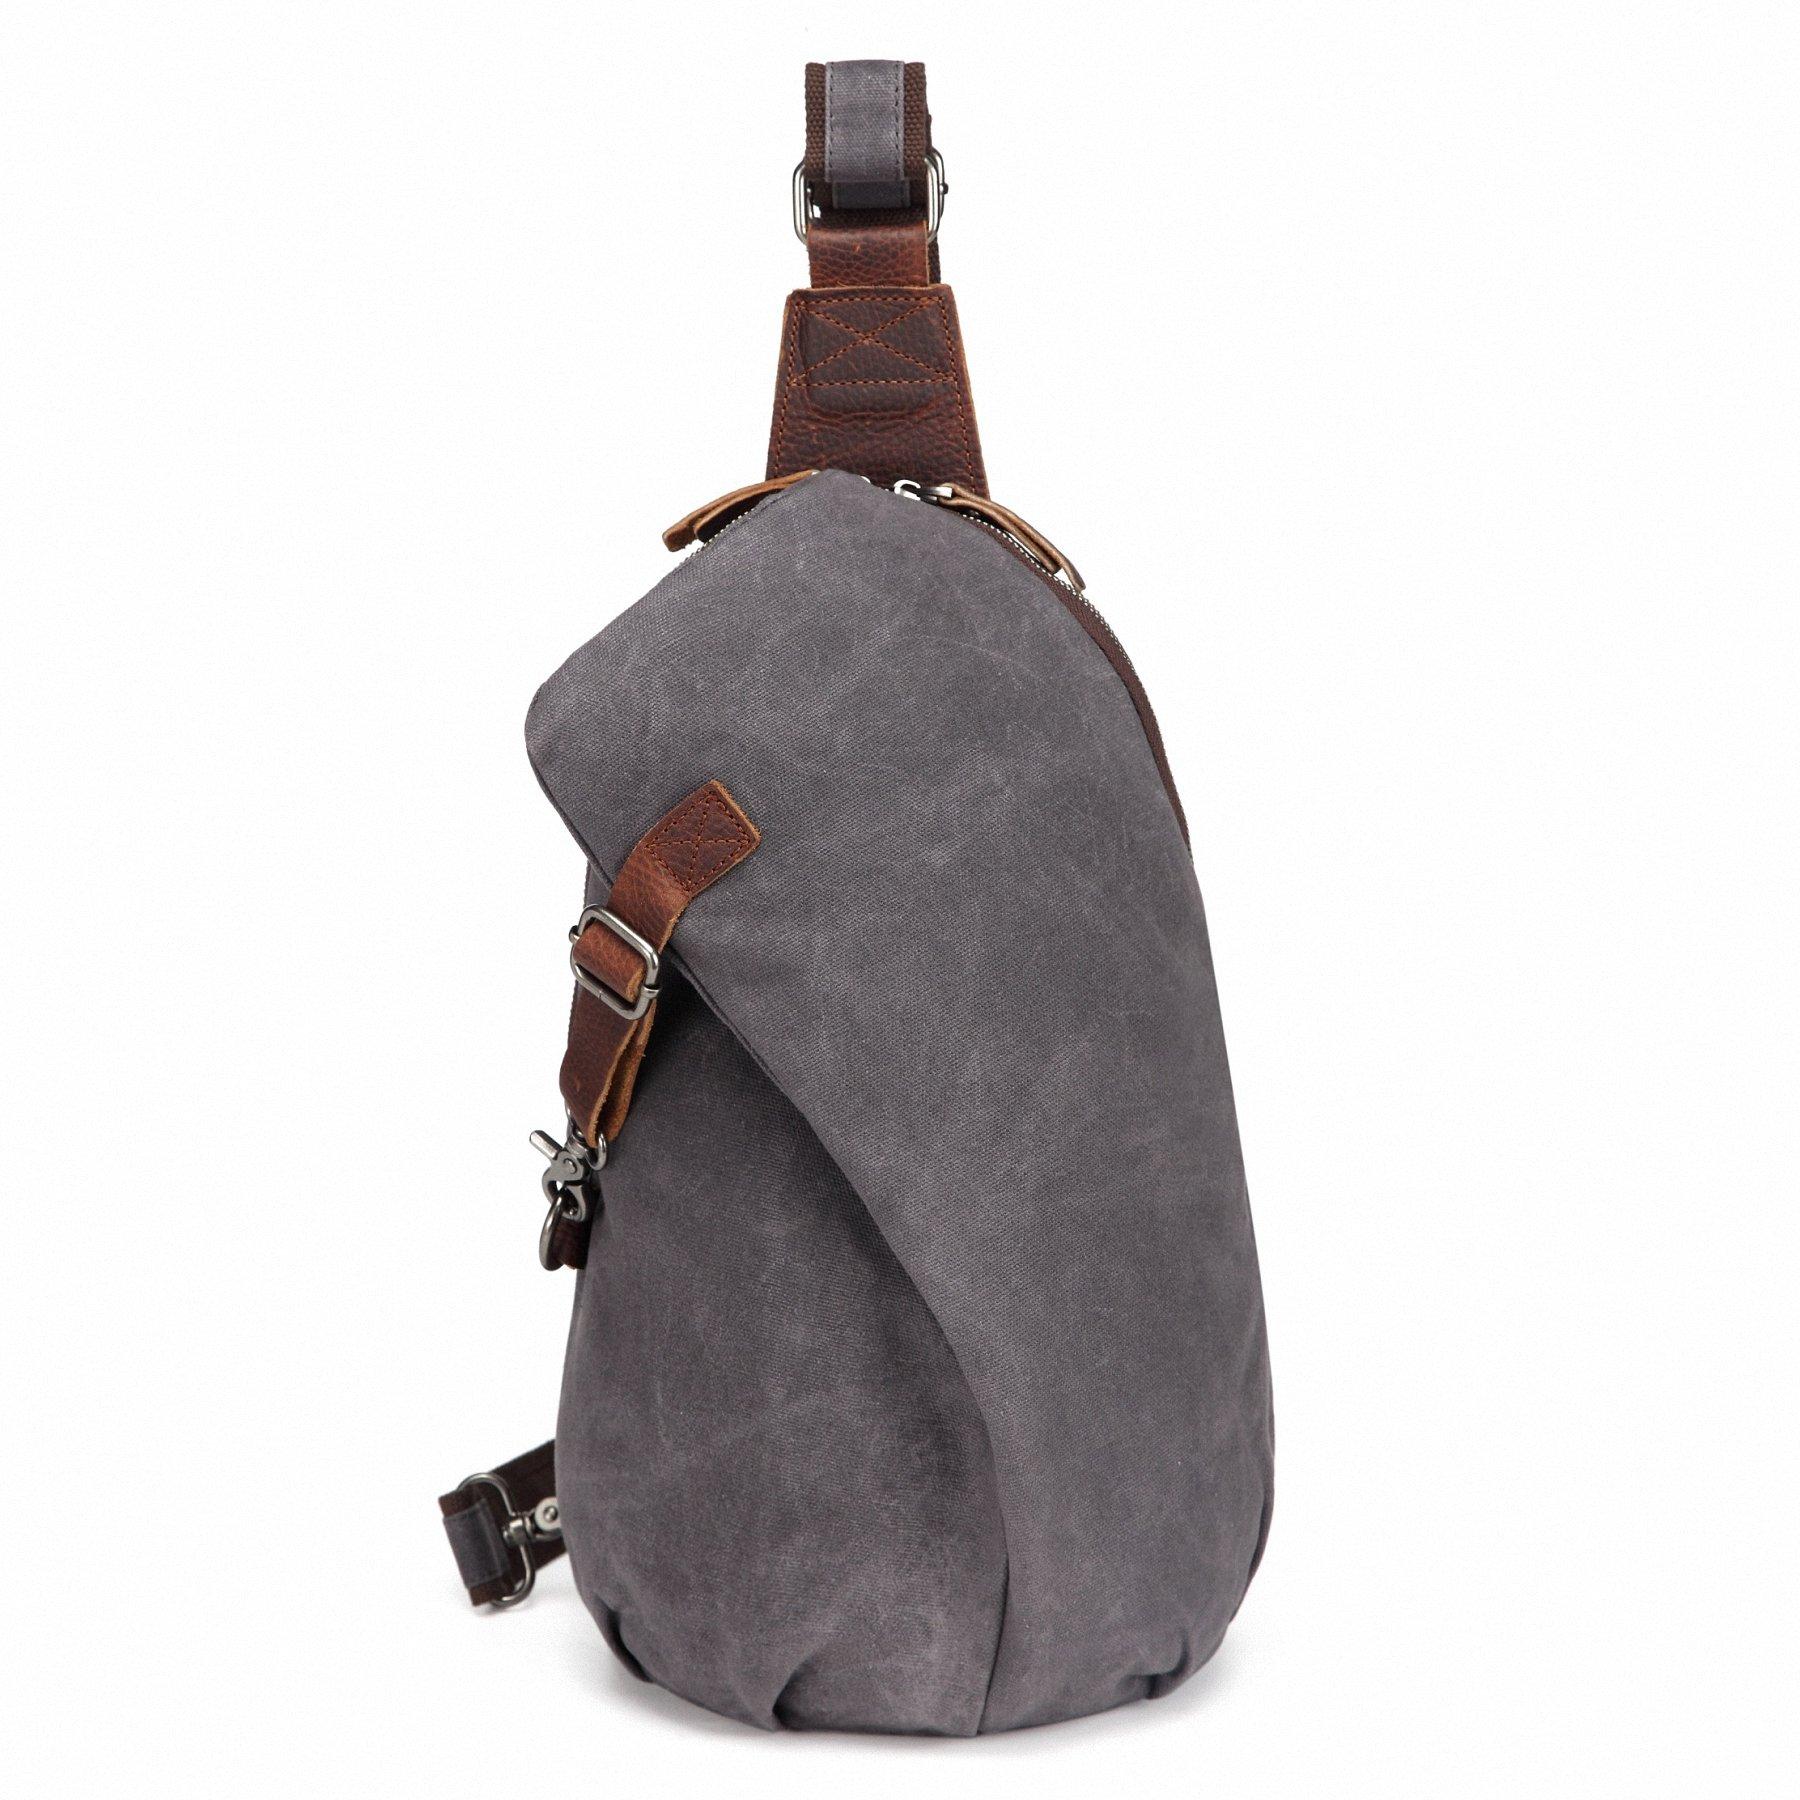 AOTIAN Men's Sling Backpack Waxed Canvas Crossbody Bag 10 Liters Gray - Purple, Warranty 2-Years